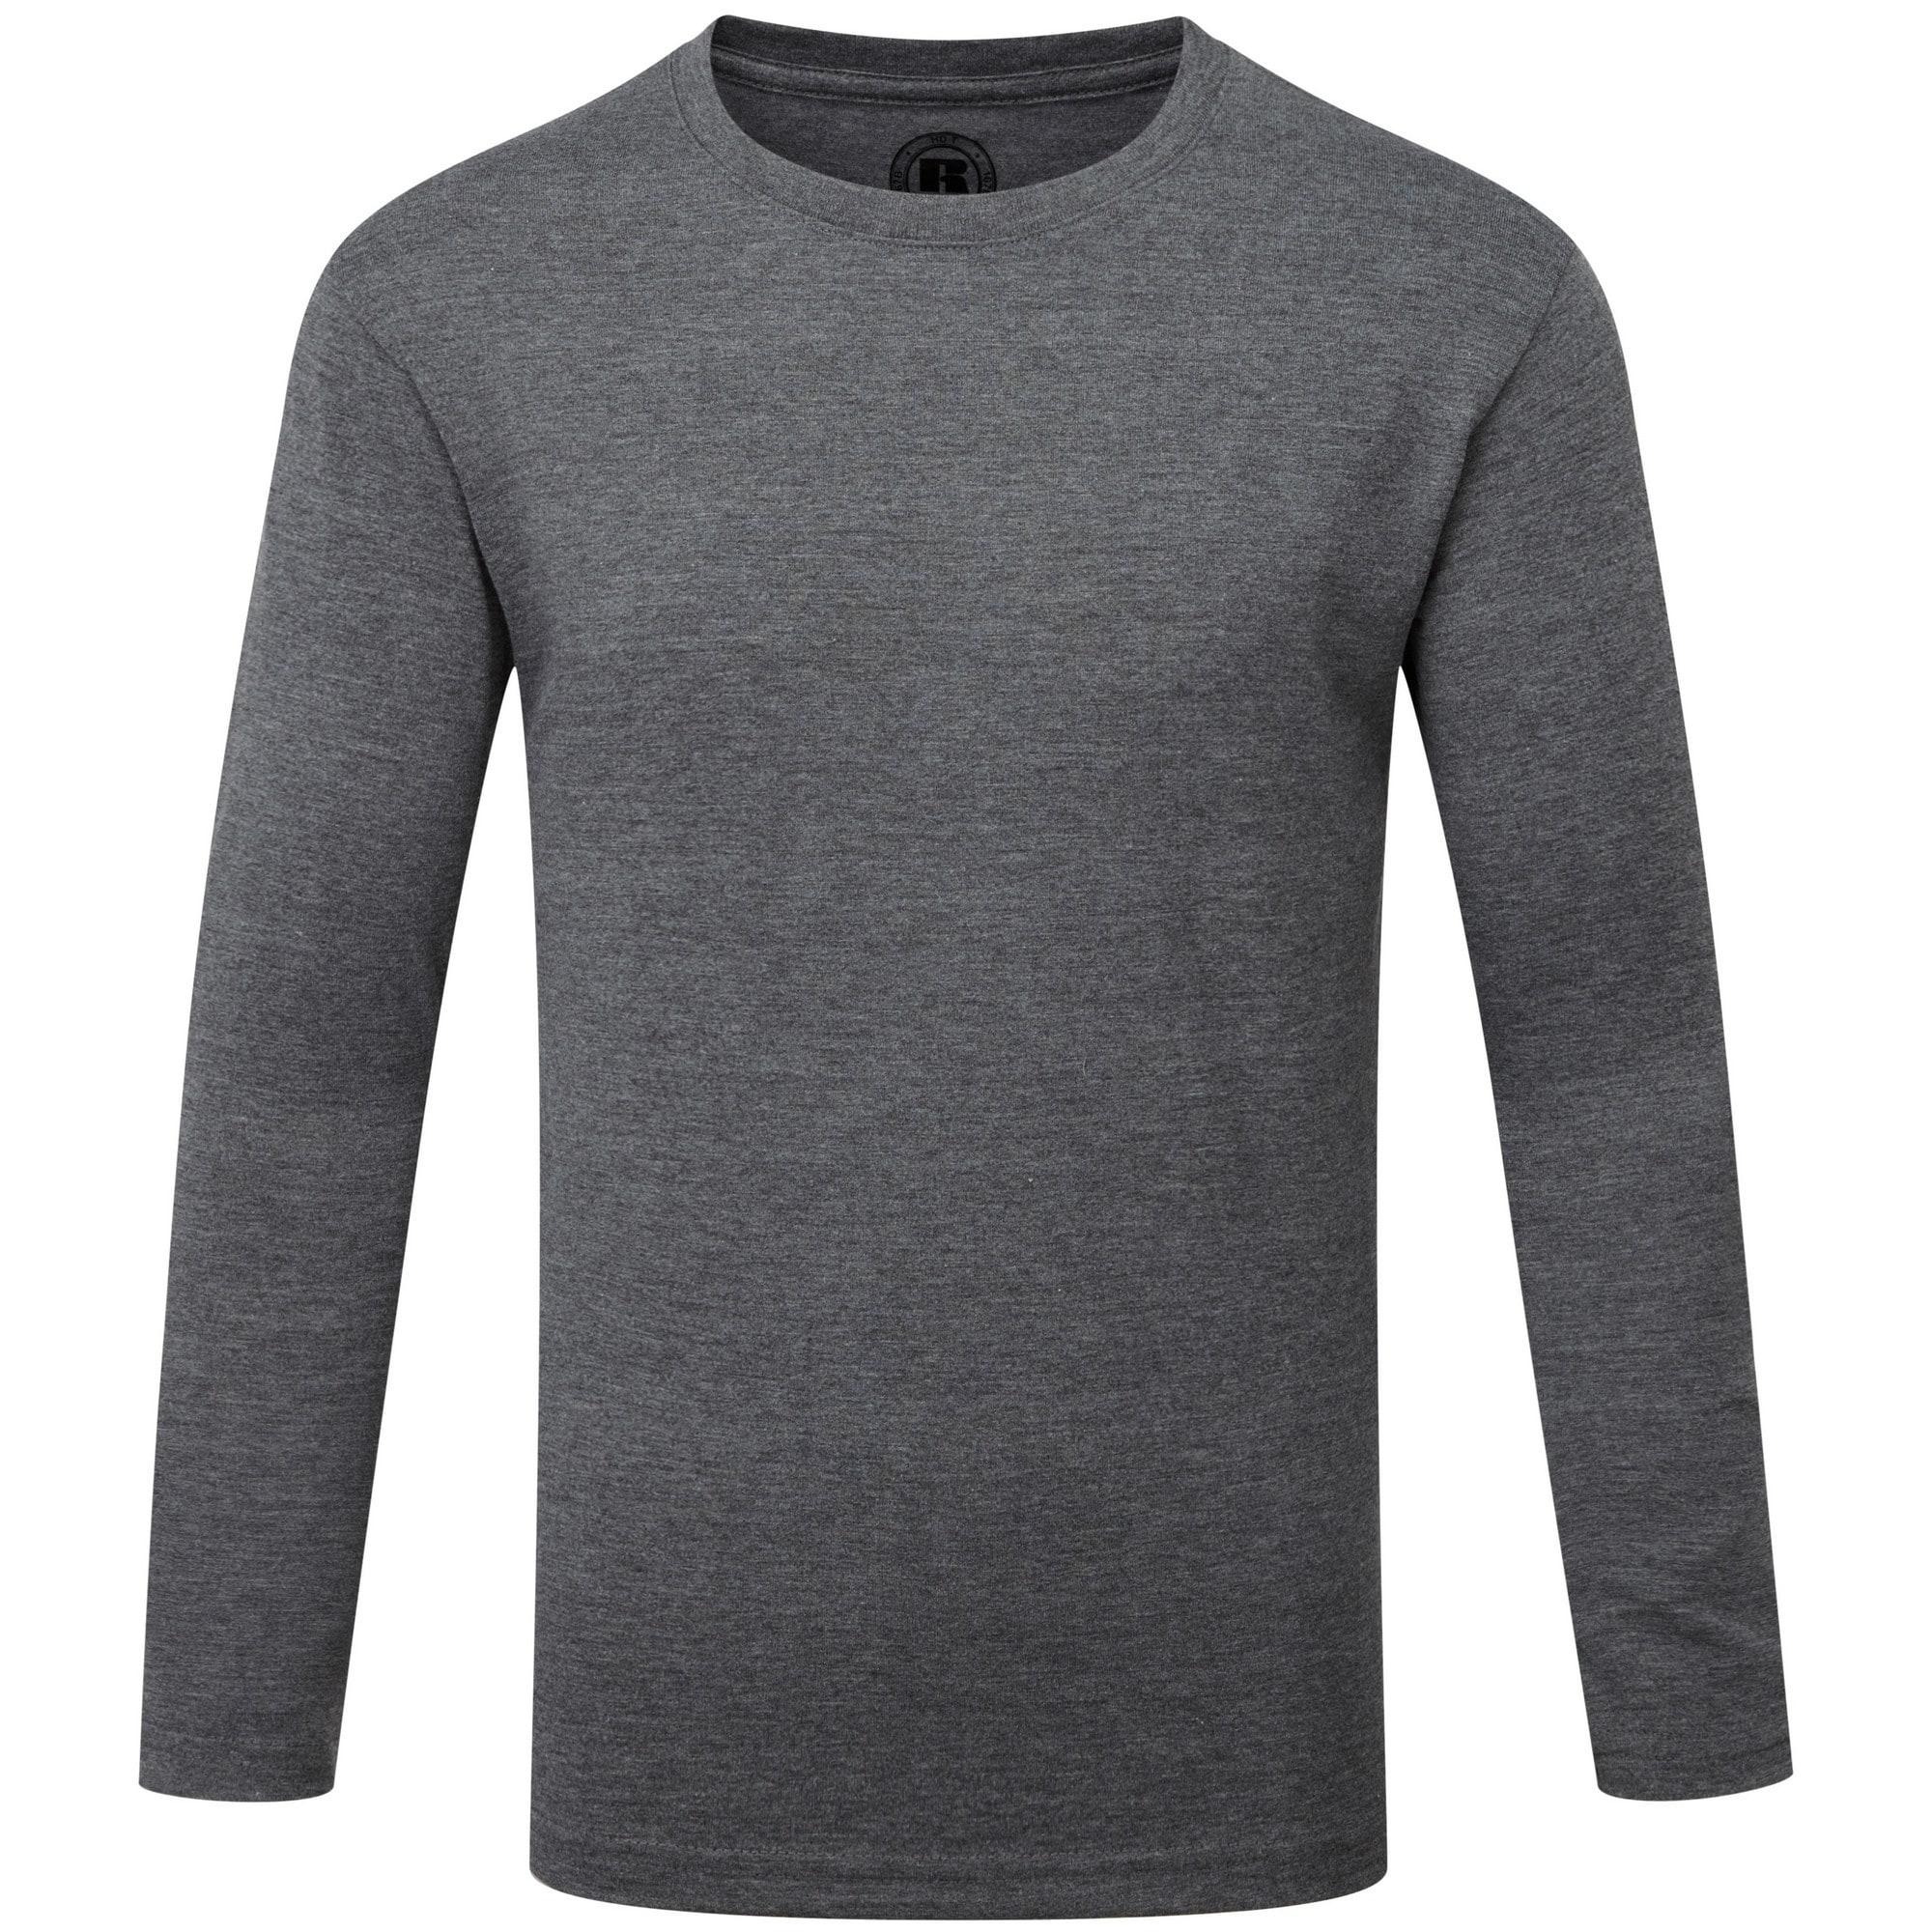 Russell Childrens//Boys Long Sleeve HD T-Shirt